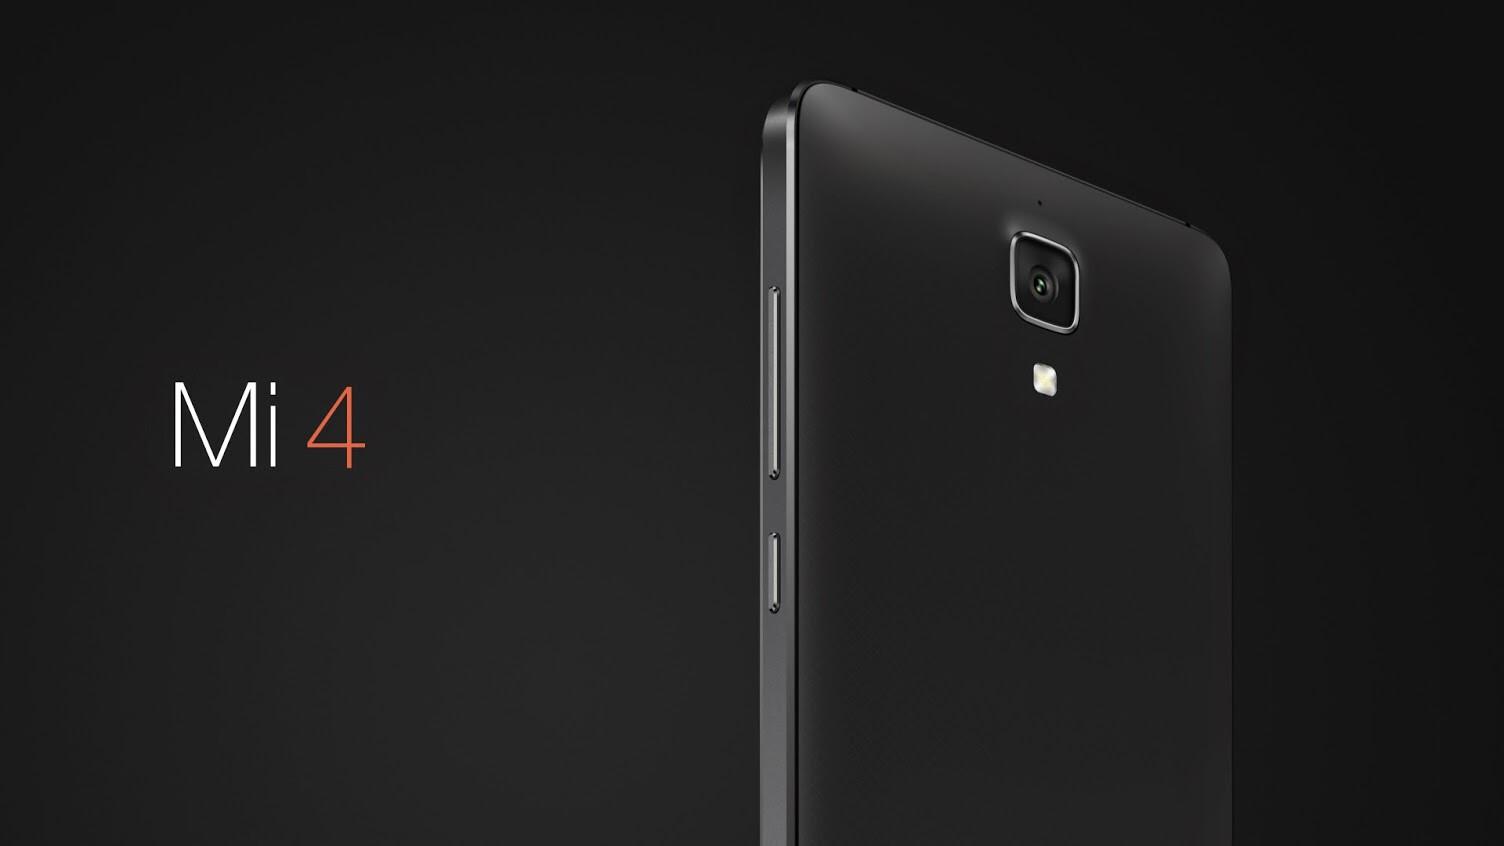 كل ما تريد معرفته عن هاتف Xiaomi Mi4 الجبار 3